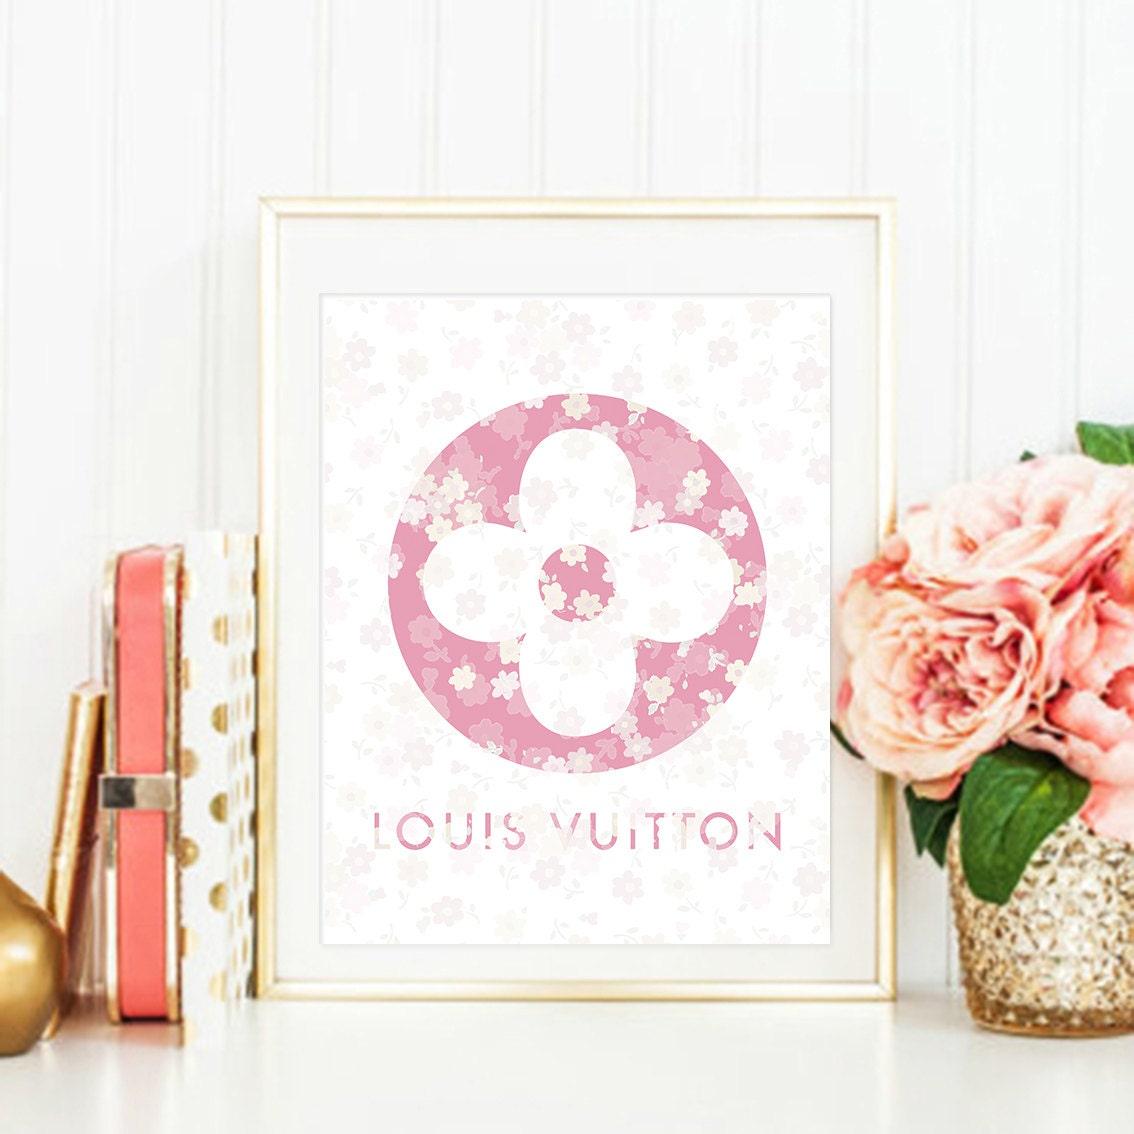 Louis Vuitton Wall Decor Flowers